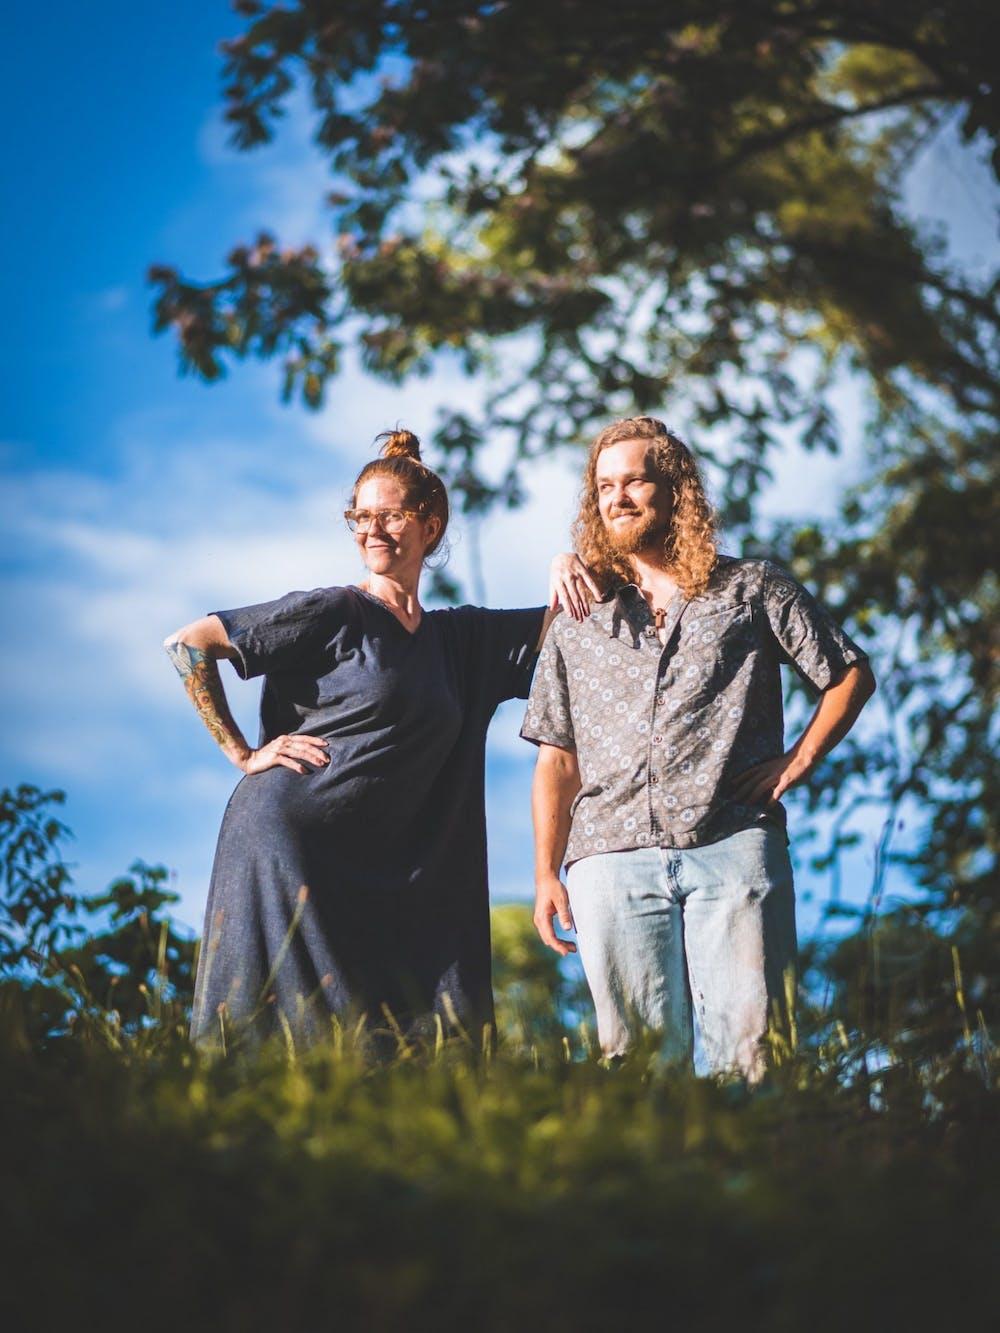 Webster's Wheel, indie-folk duo, hosts performances across Auburn